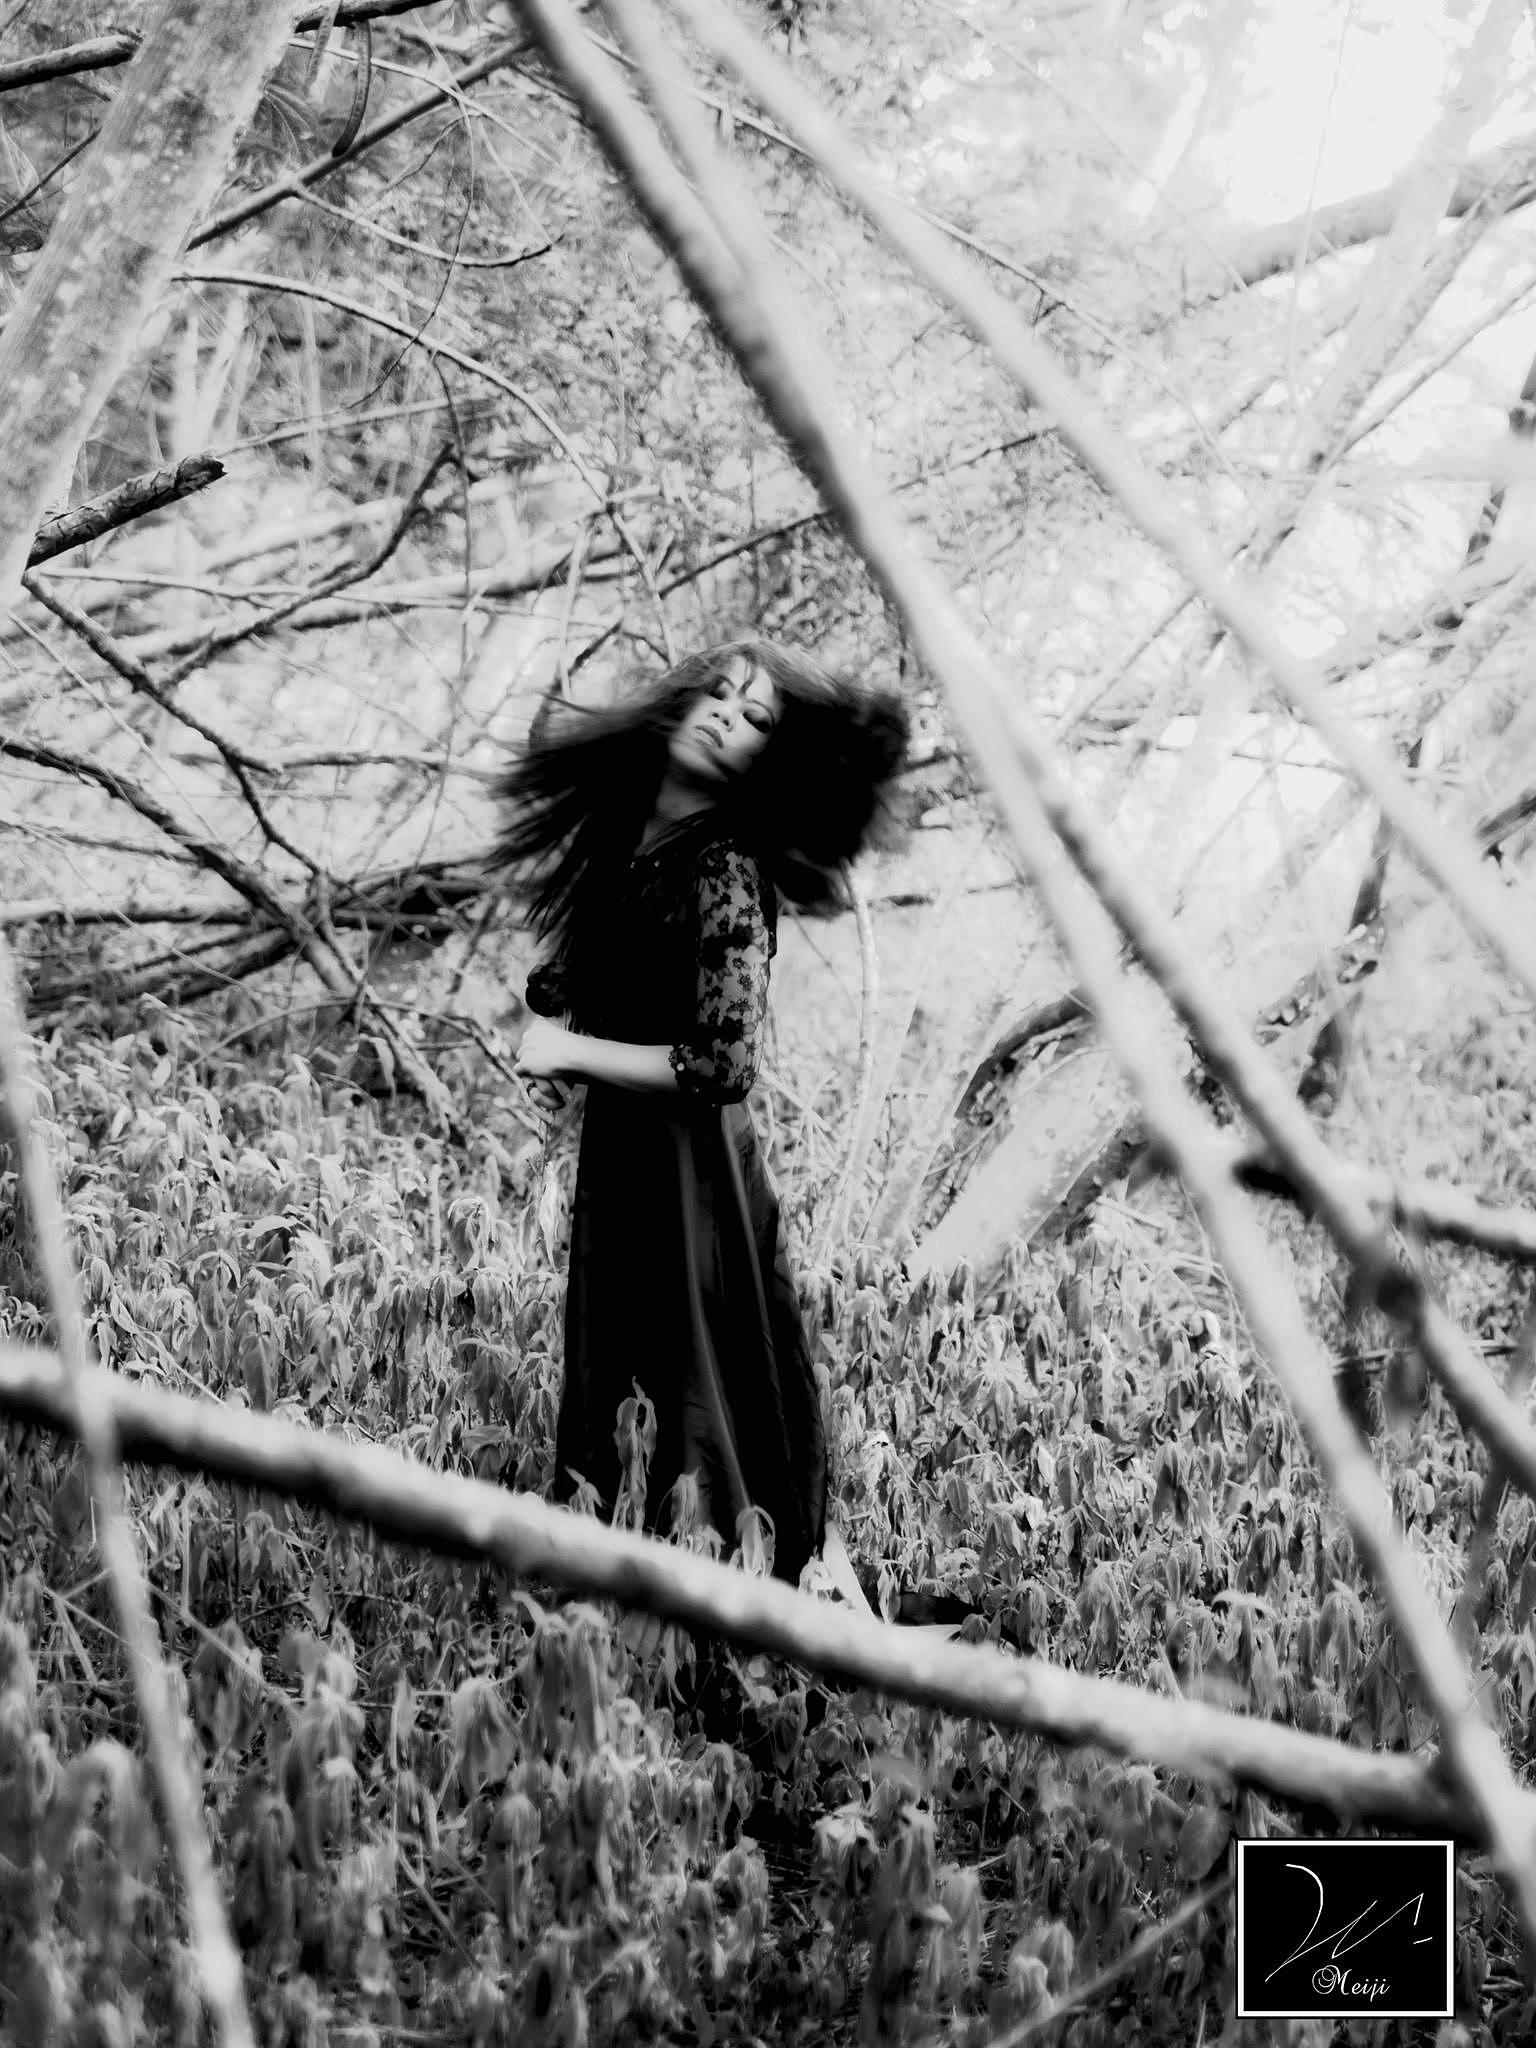 #darkbeauty #fineartphotography #colorizemood #passion by zura